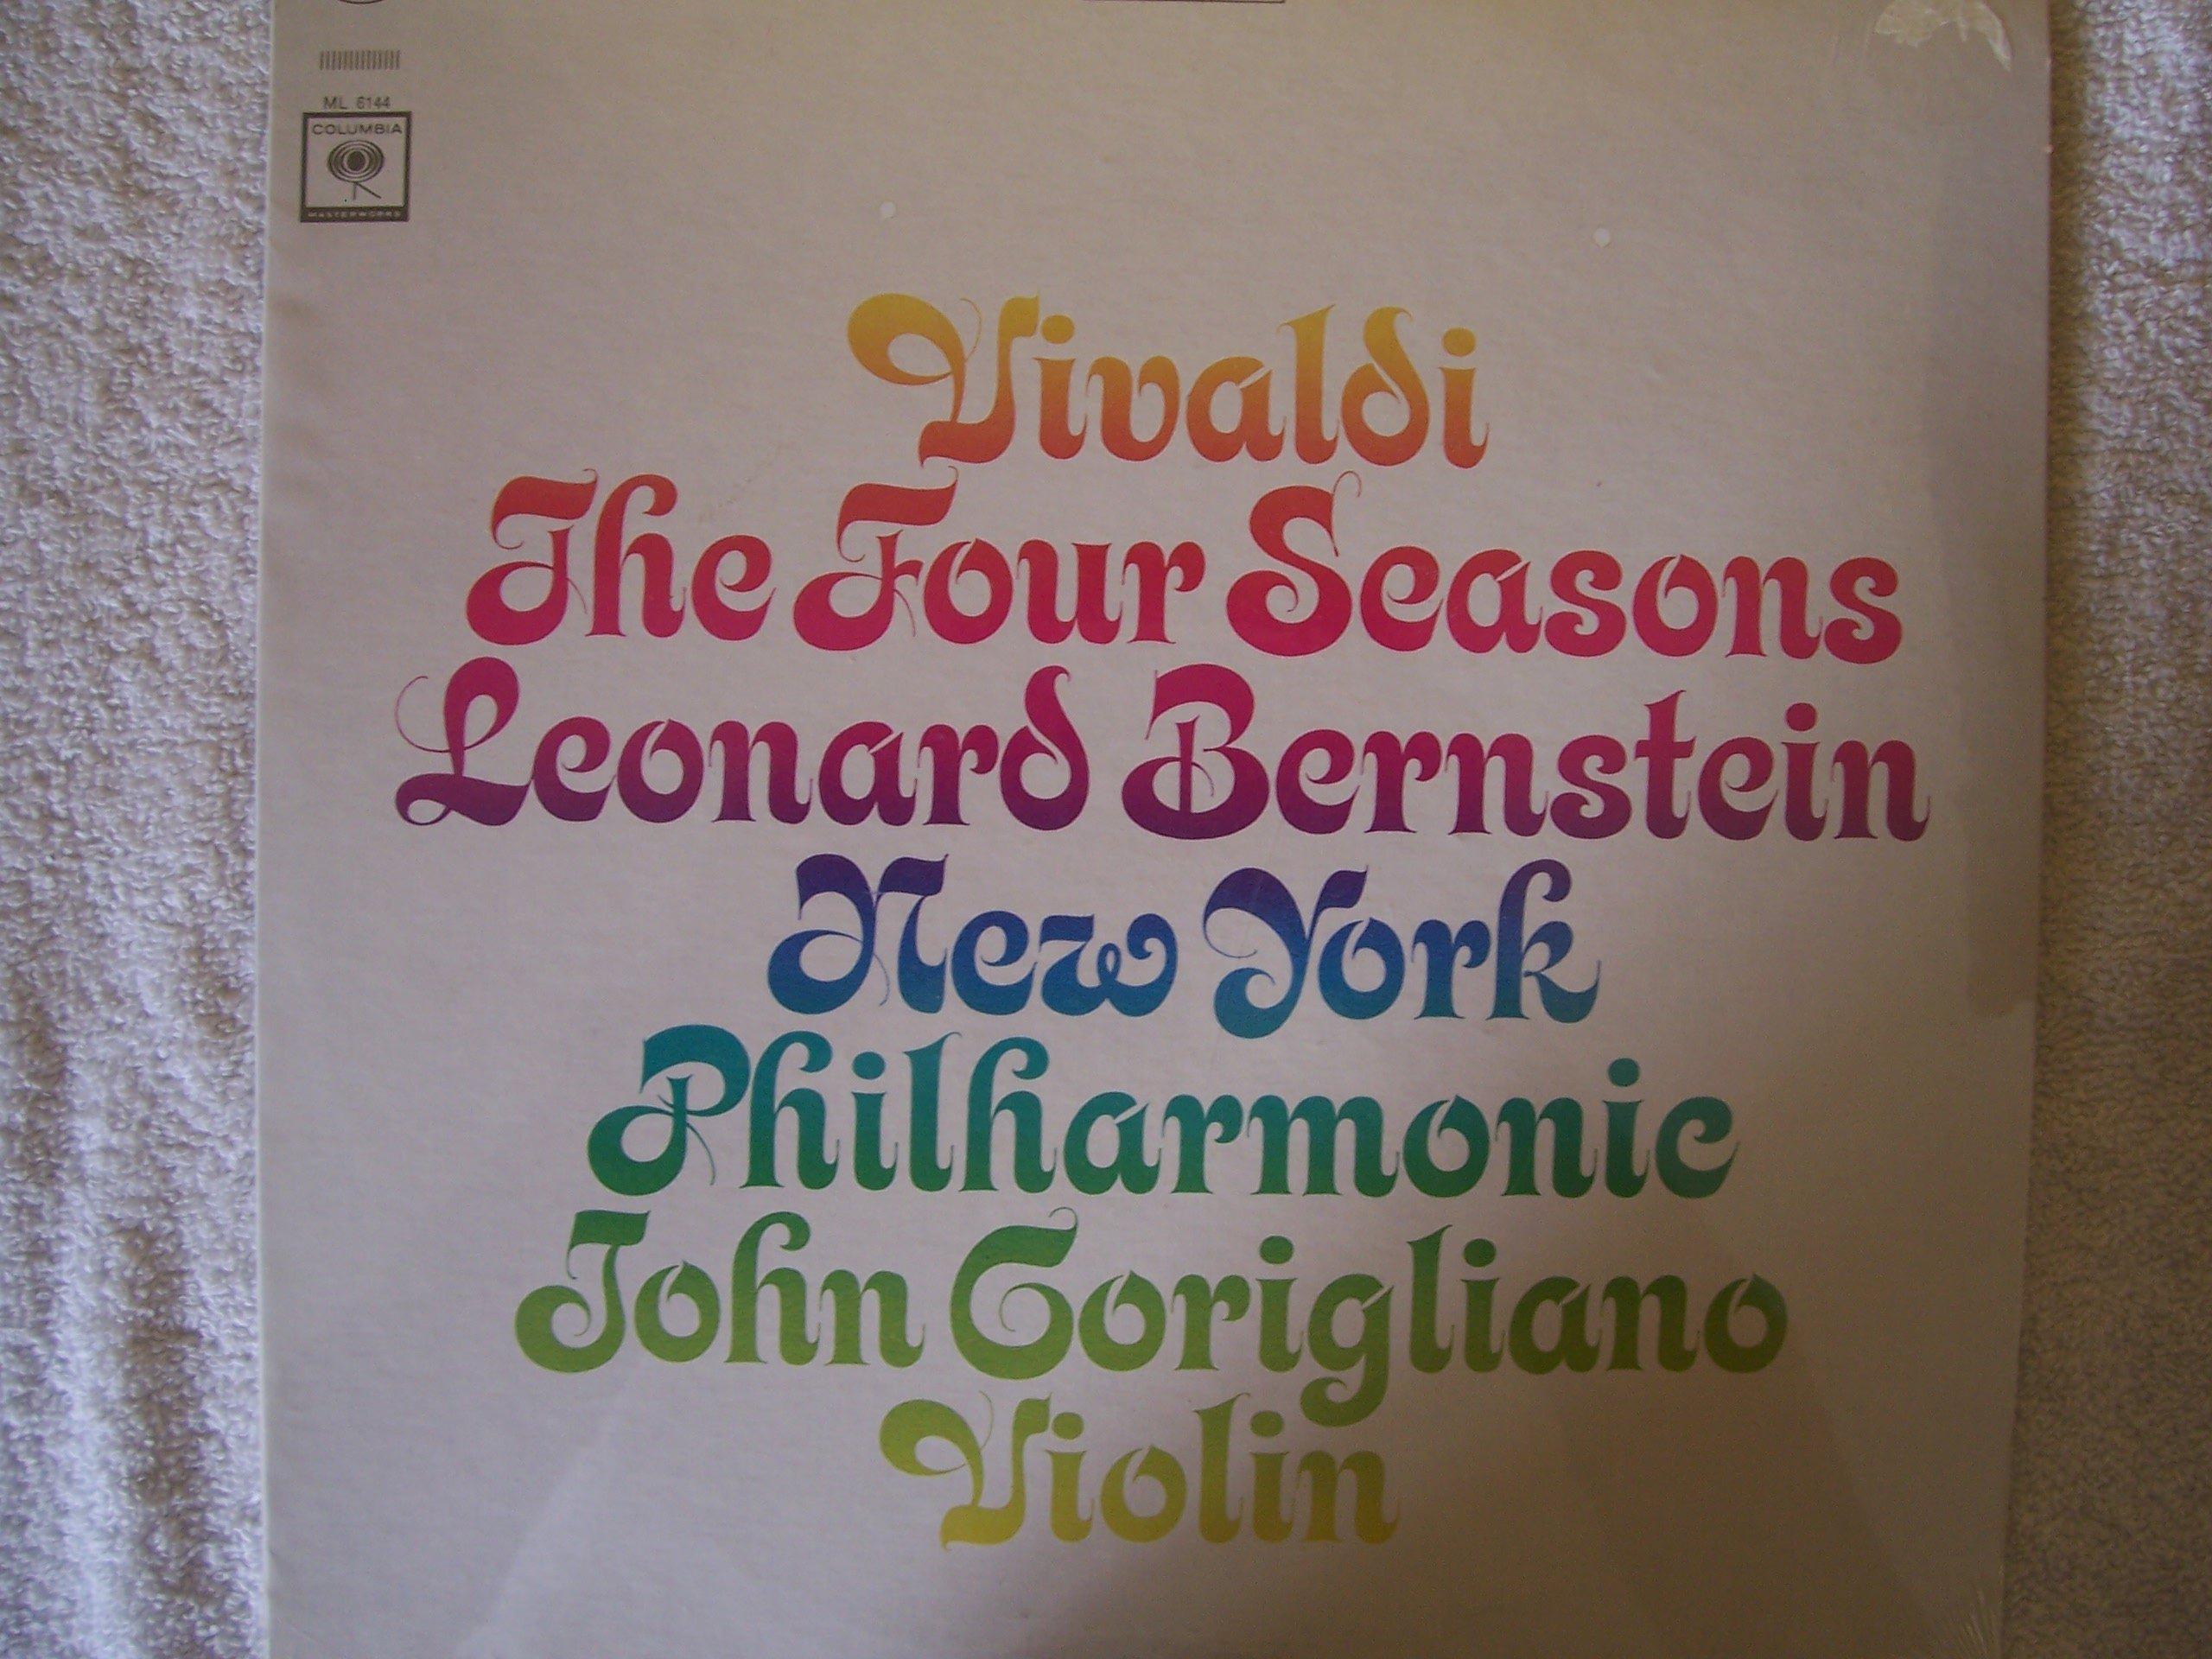 Vivaldi The Four Season - Leonard Bernstein, New York Philharmonic , John Corigliano, Violin by Columbia Masterworks Mono